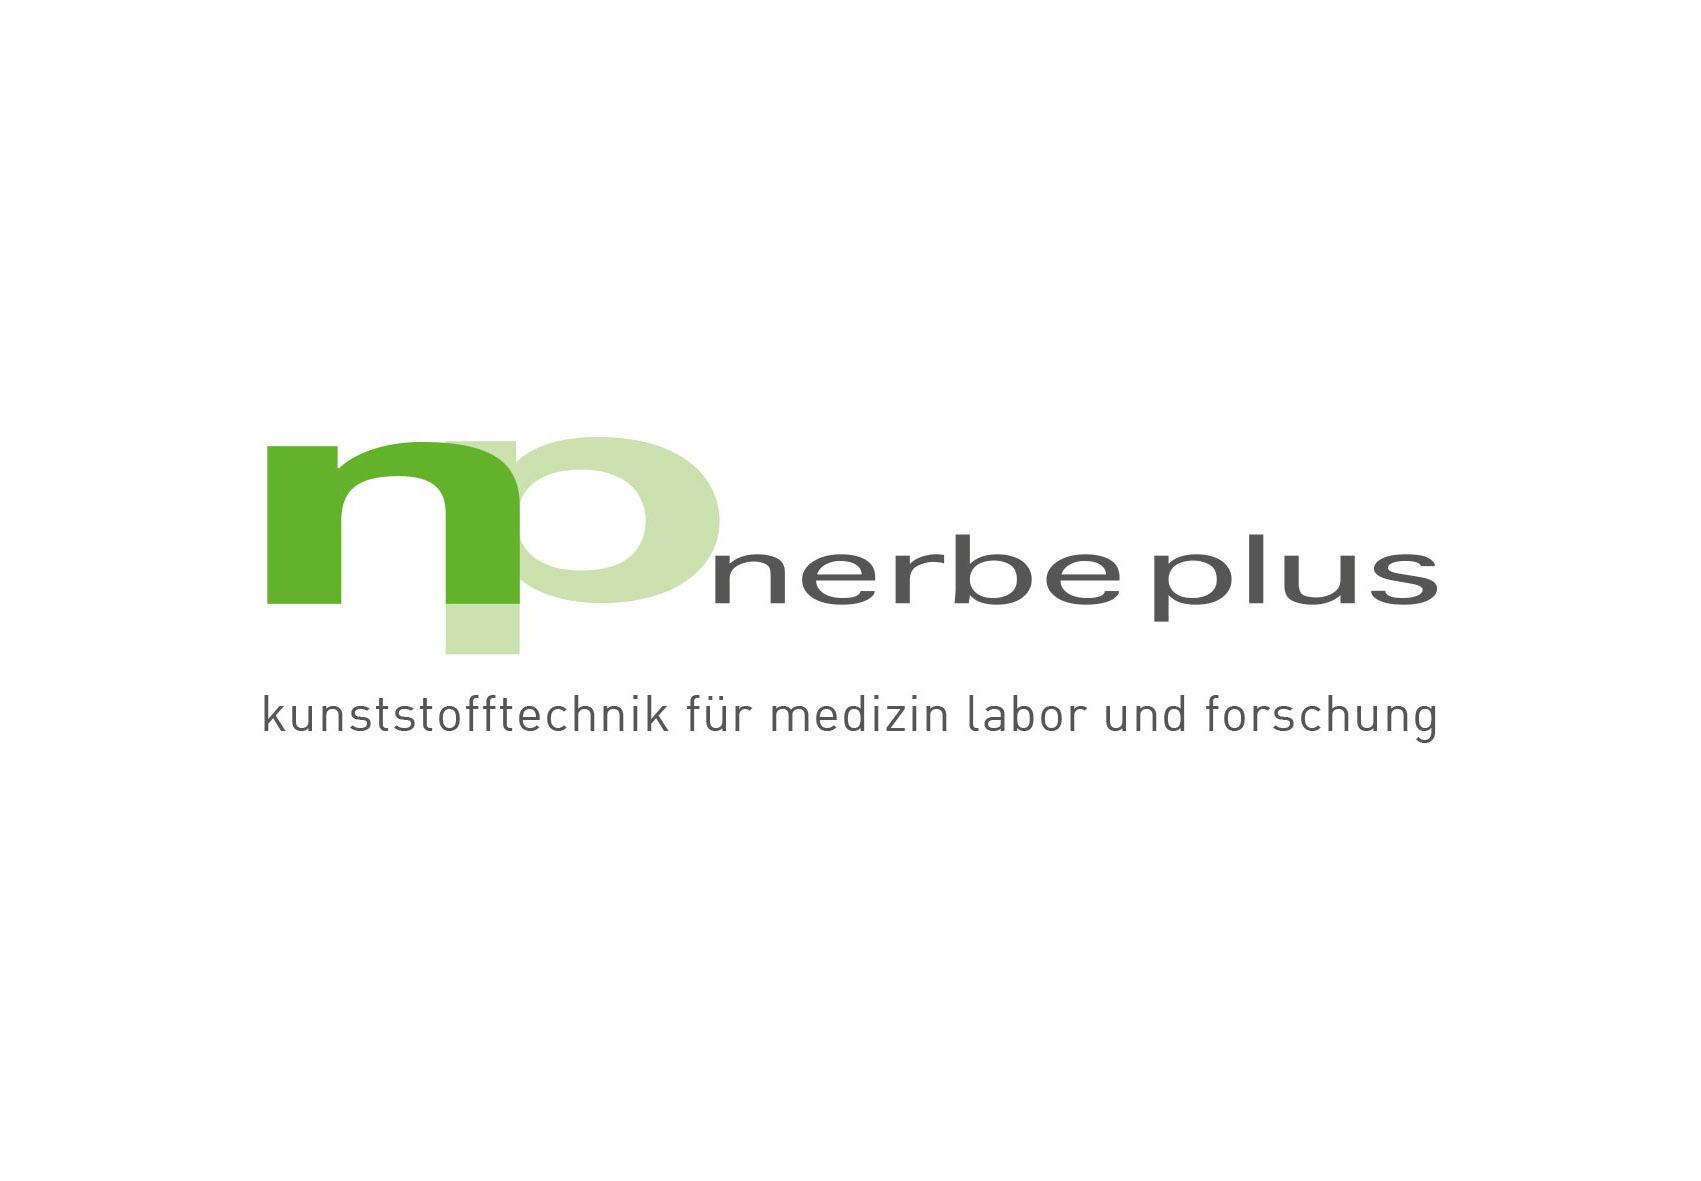 Nerbe Plus GmbH & Co KG